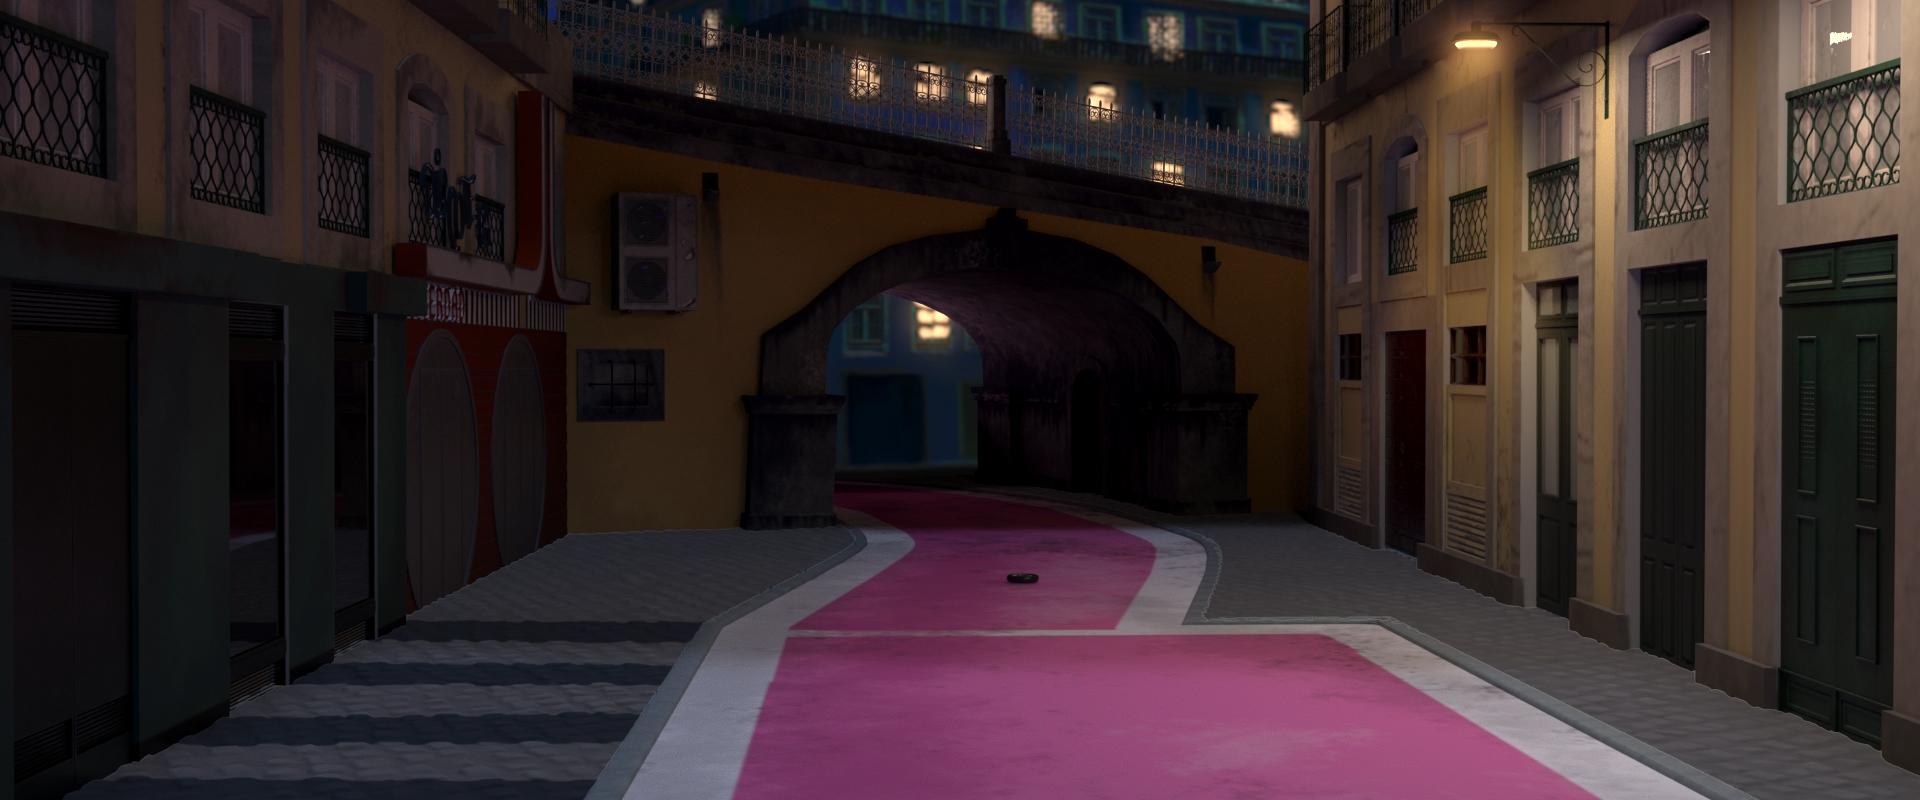 LisbonNight.jpg